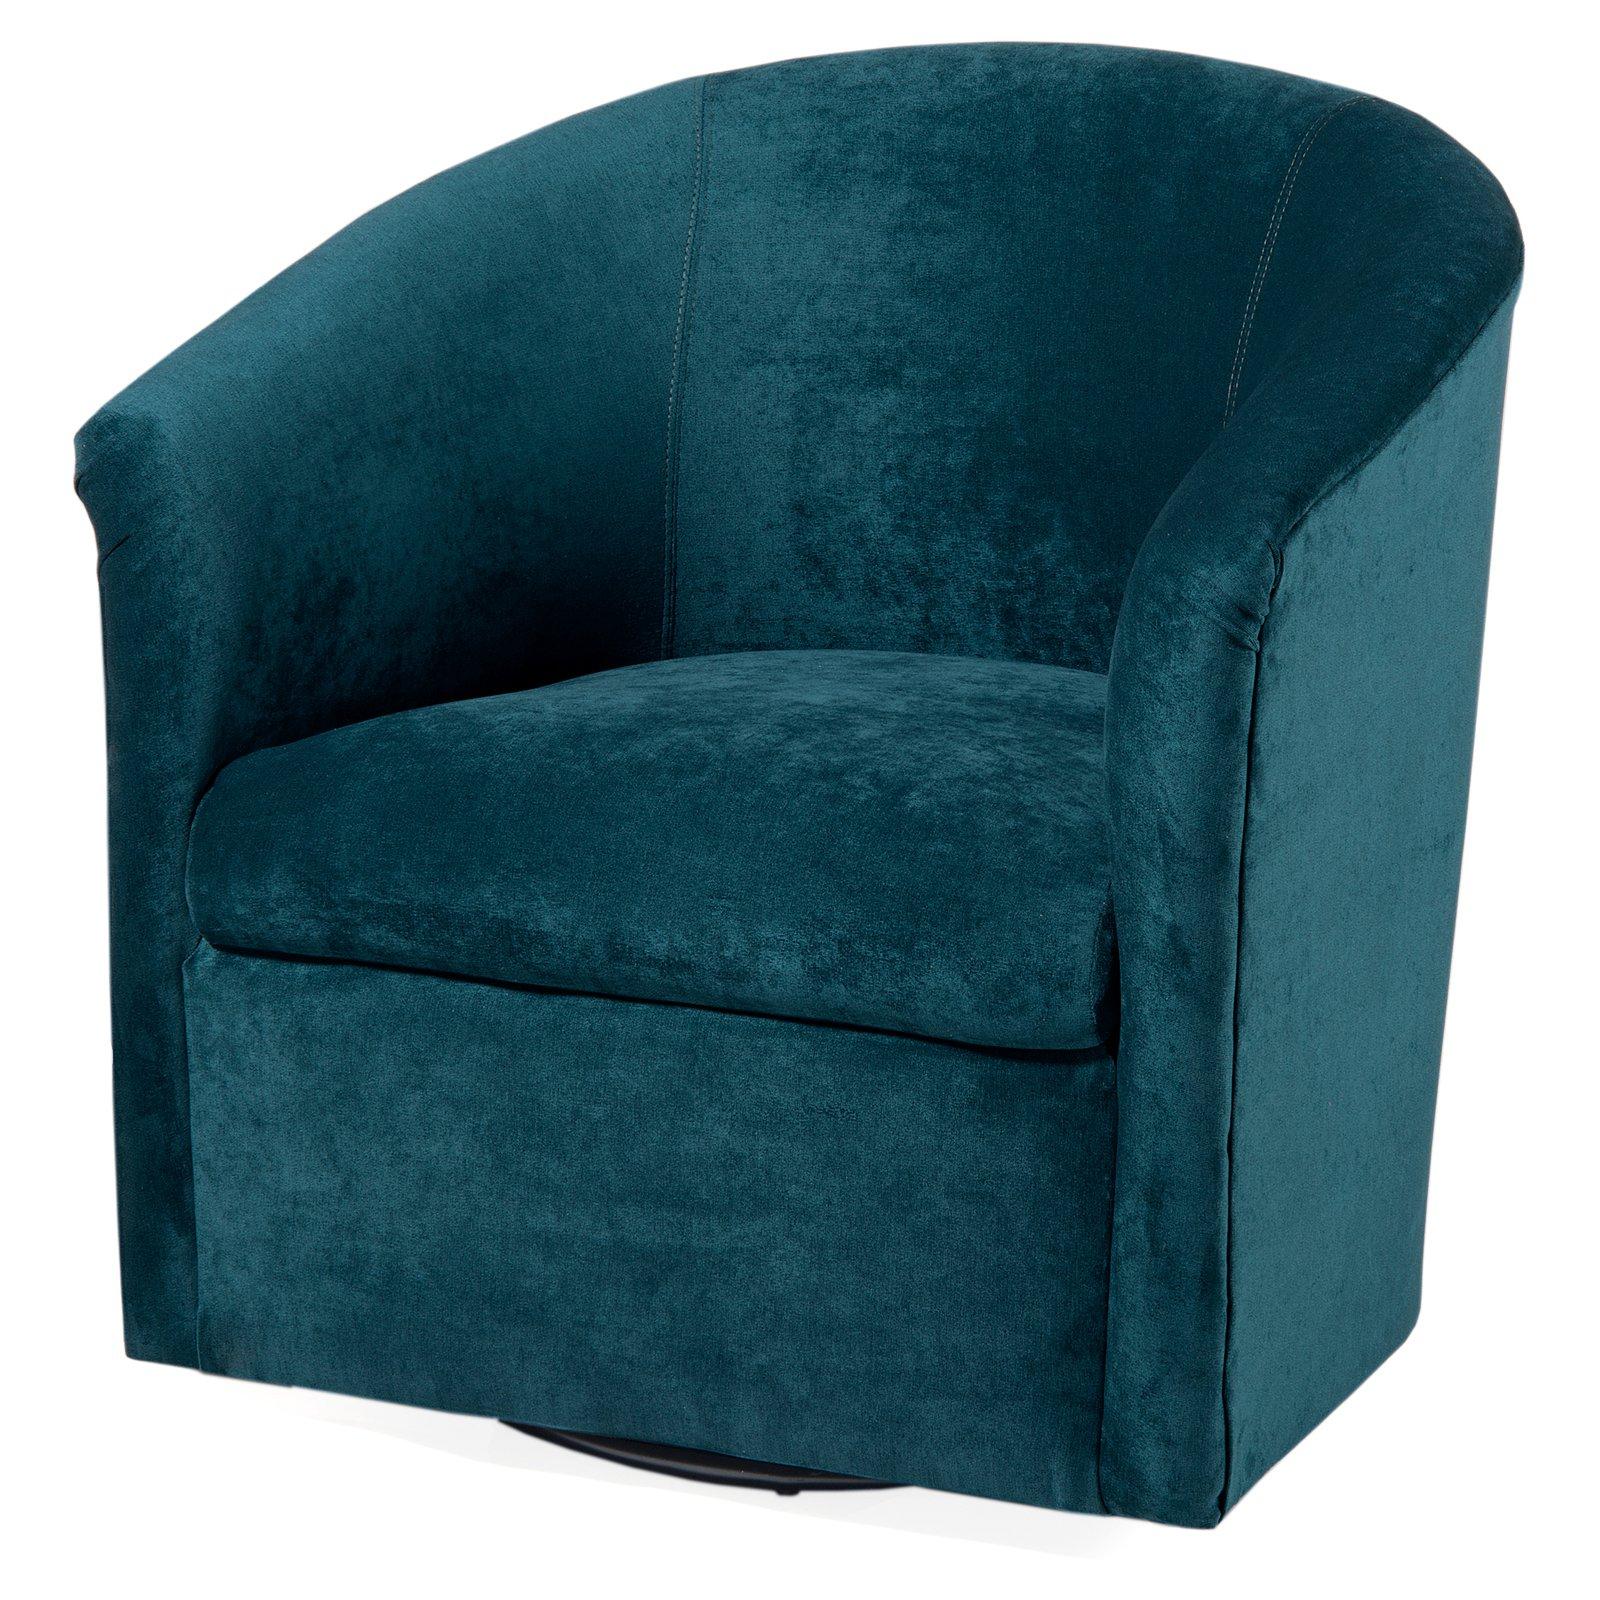 Comfort Pointe Elizabeth Swivel Chair